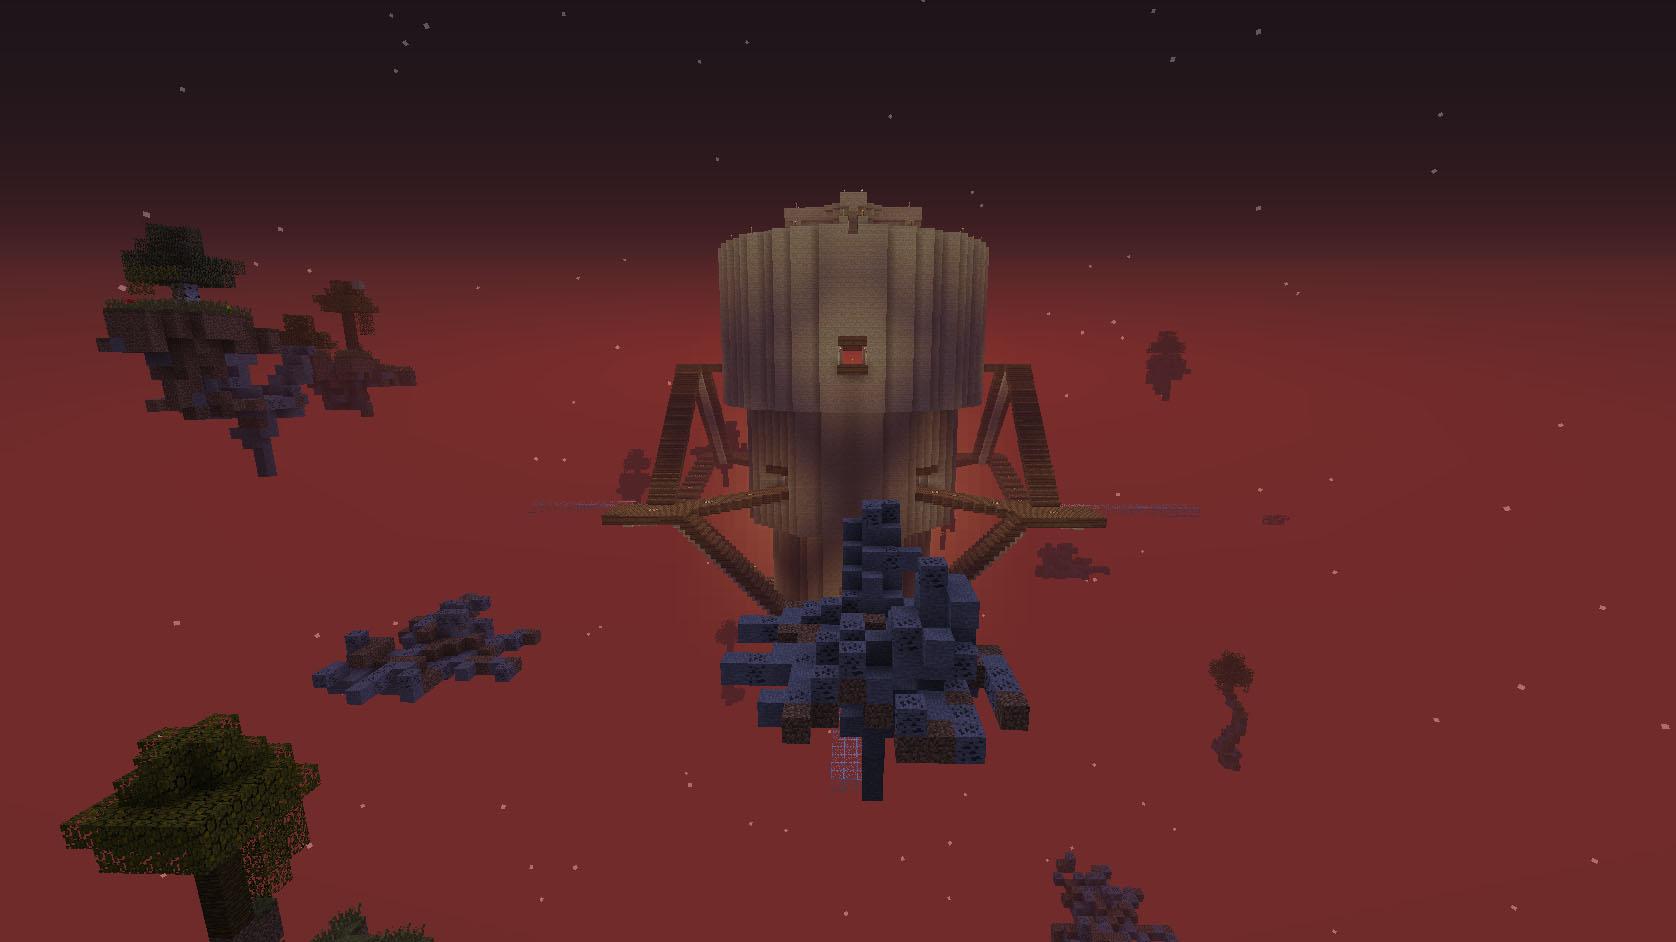 http://minecraft-forum.net/wp-content/uploads/2013/06/ff310__Ruins-Of-The-Mindcrackers-Map-3.jpg